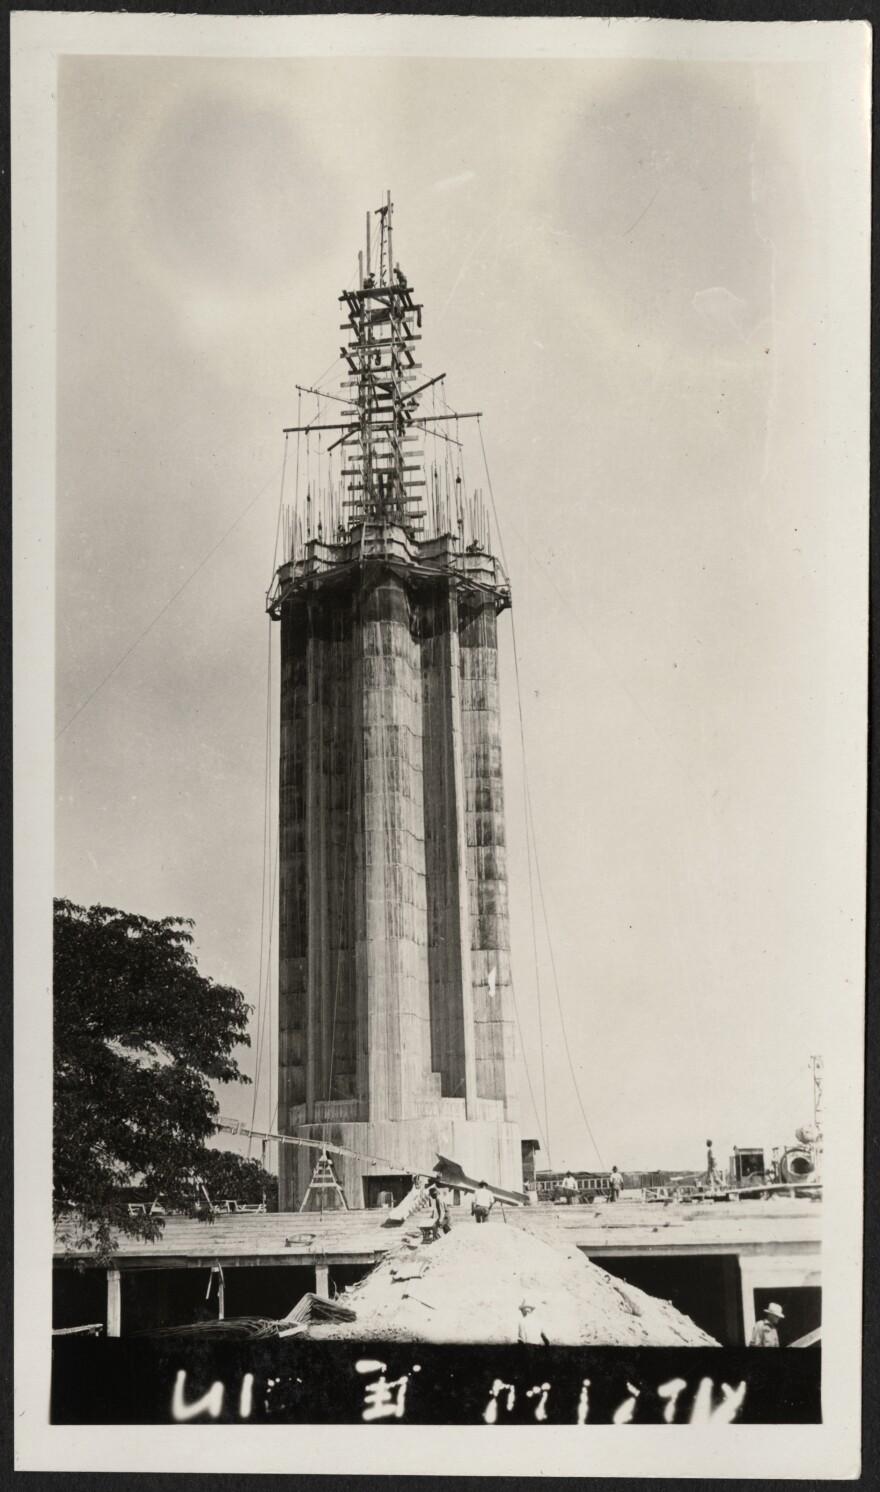 memorial_court_1948.2.1.145.jpg